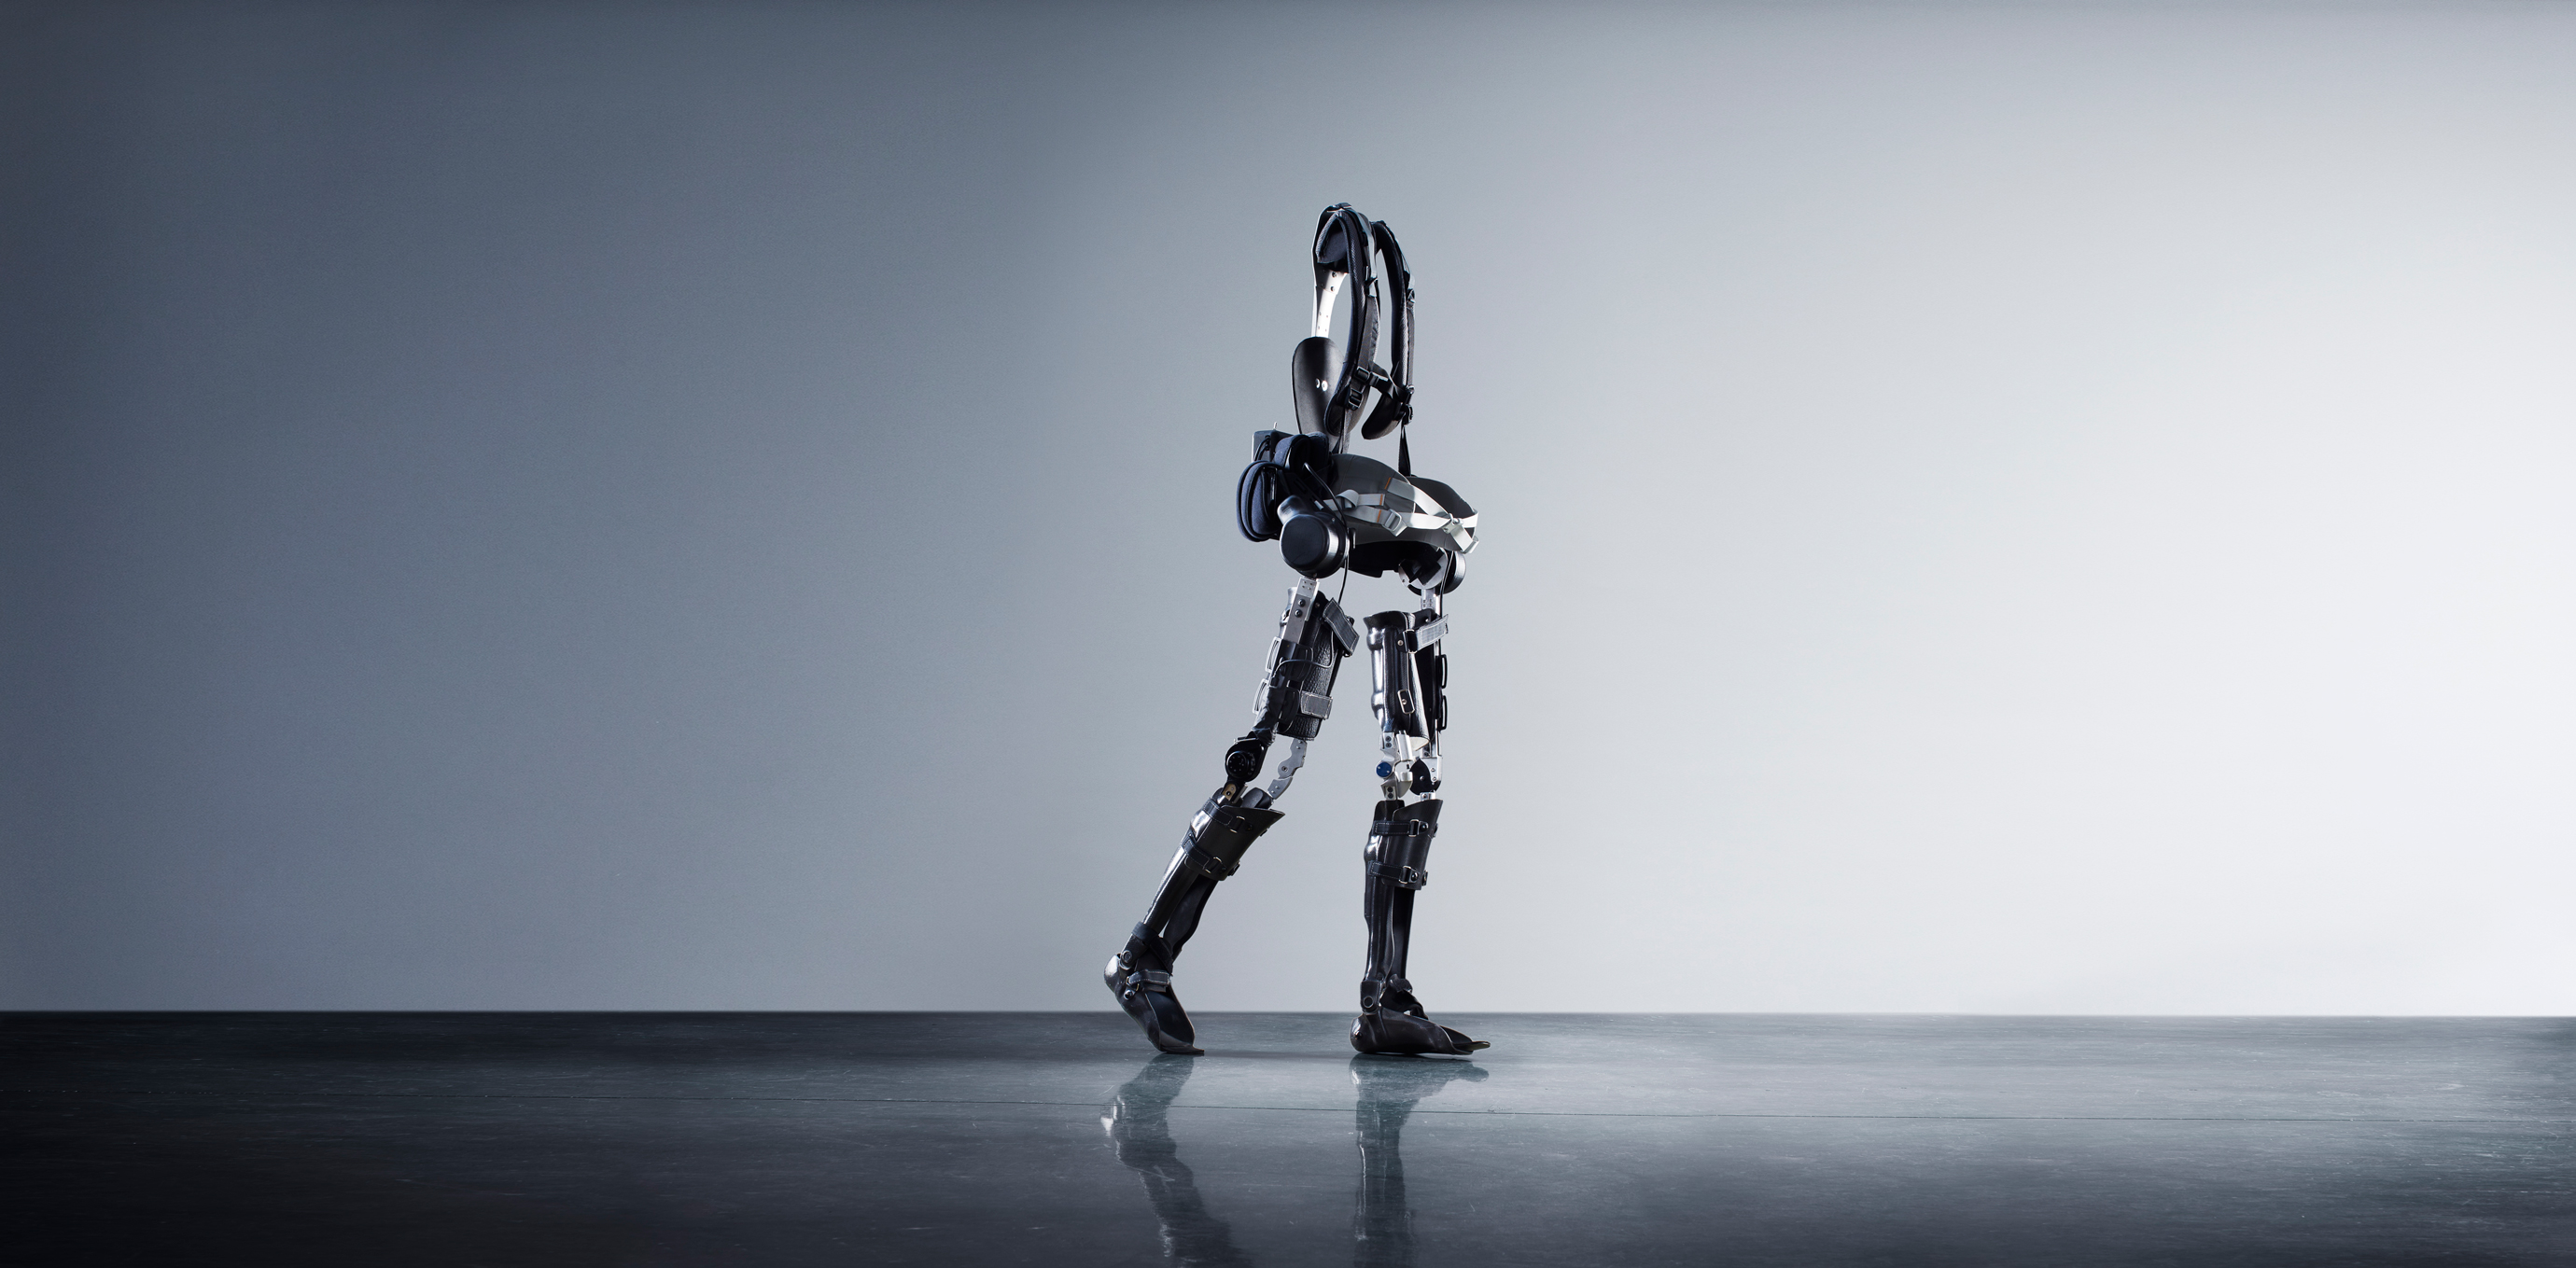 Powered exoskeleton paraplegic dating